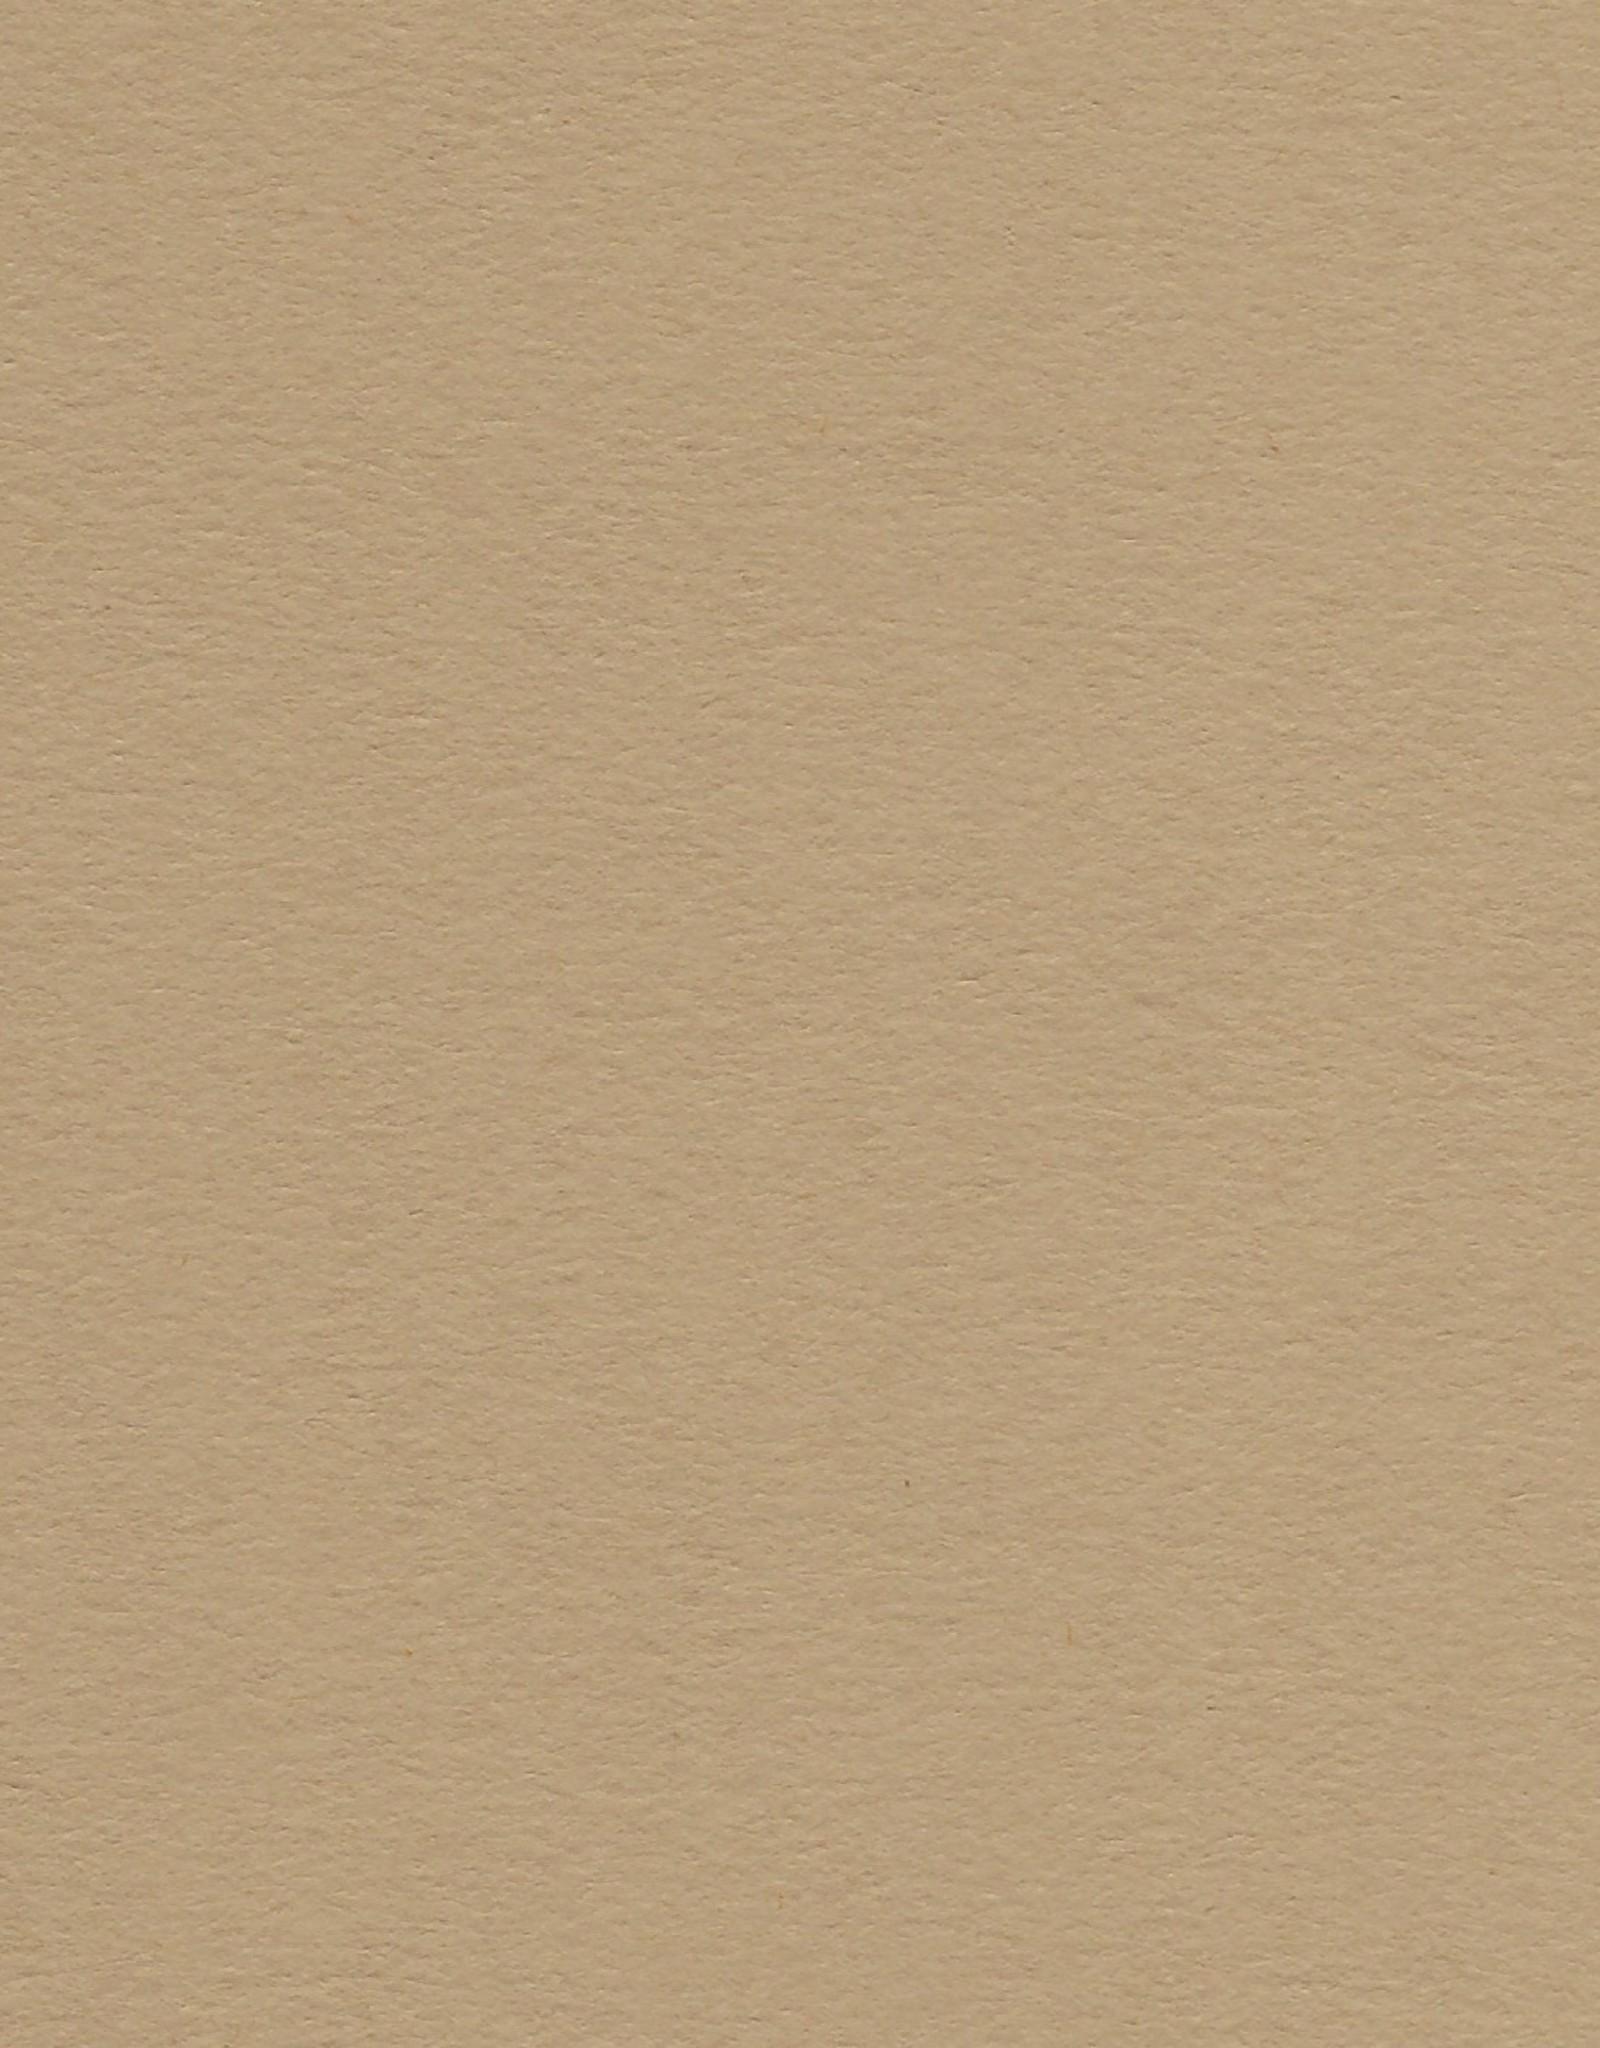 "Colorplan, 91#, Text, Harvest, 25"" x 38"", 135 gsm"